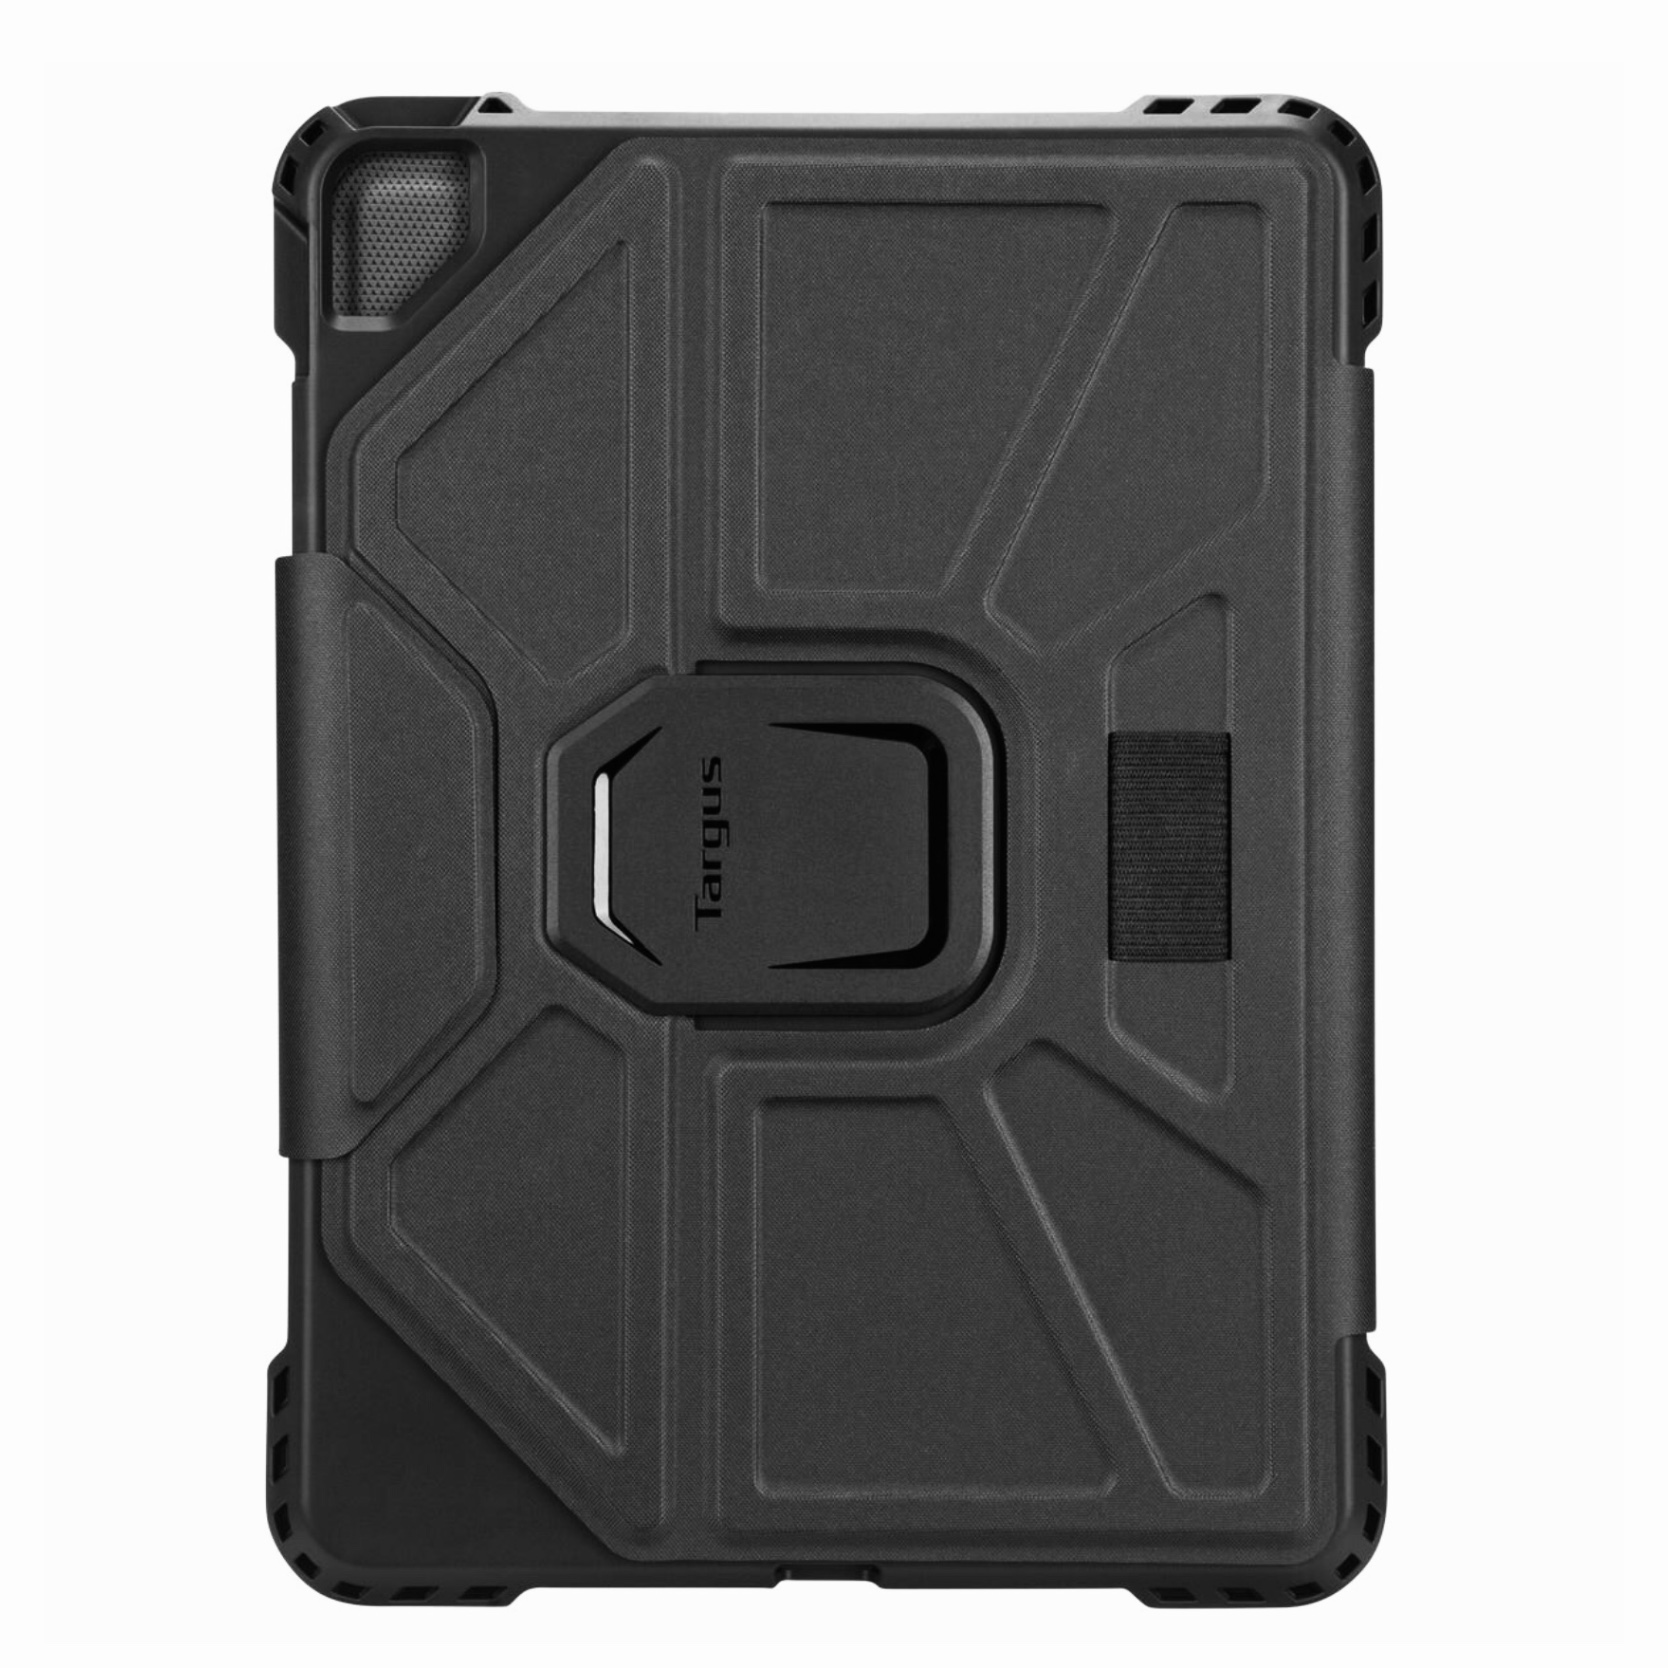 iPad PRO 2018 11 pouces Etui professionnel Rotatif Multi angles TEK Noir